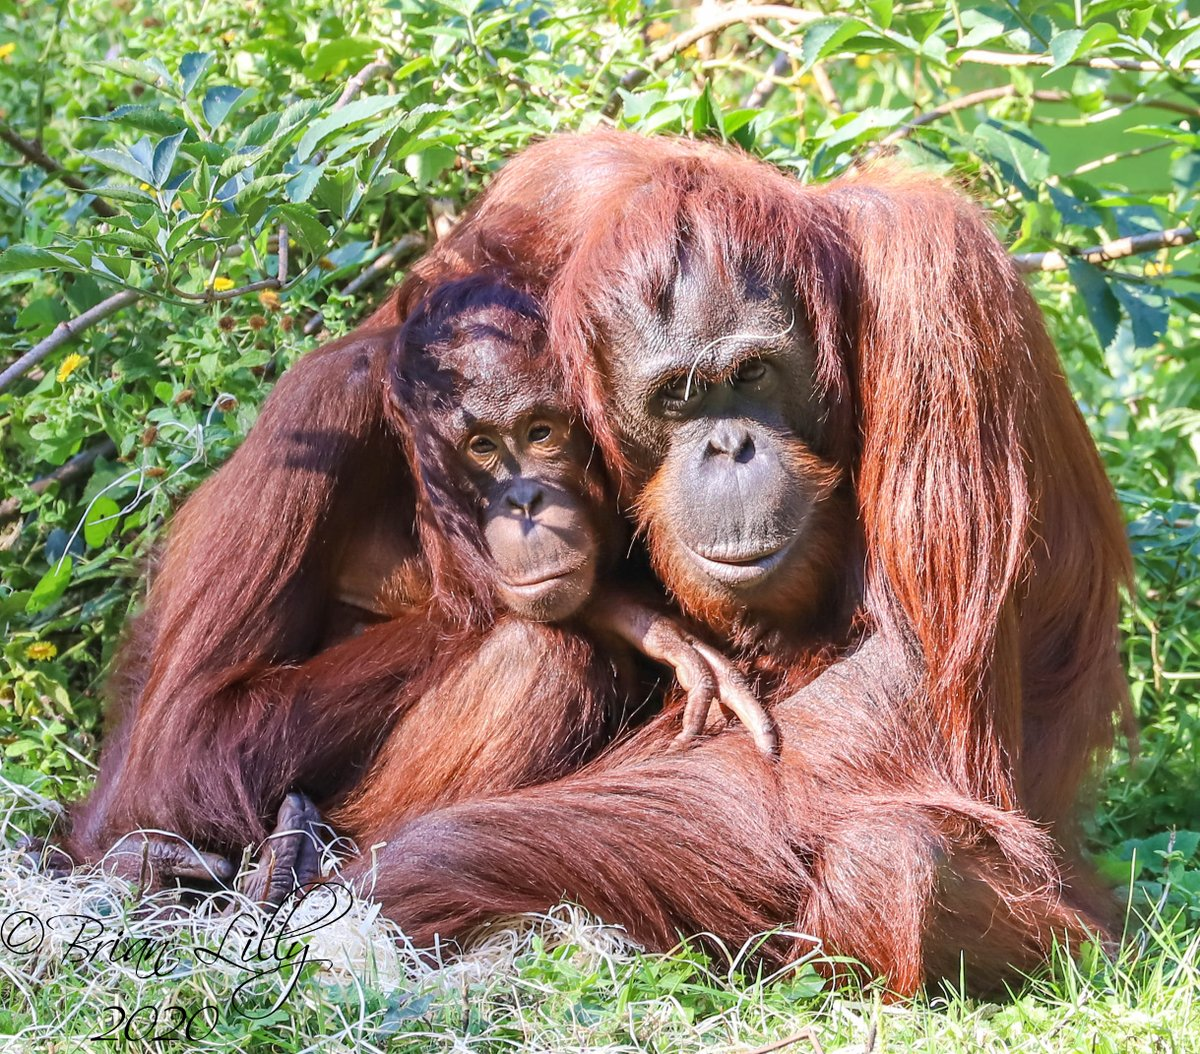 Bornean orangutans 'Tatau' and mother 'Mali' having a cuddle @PaigntonZoo #orangutans https://t.co/qSEaBdUt7H